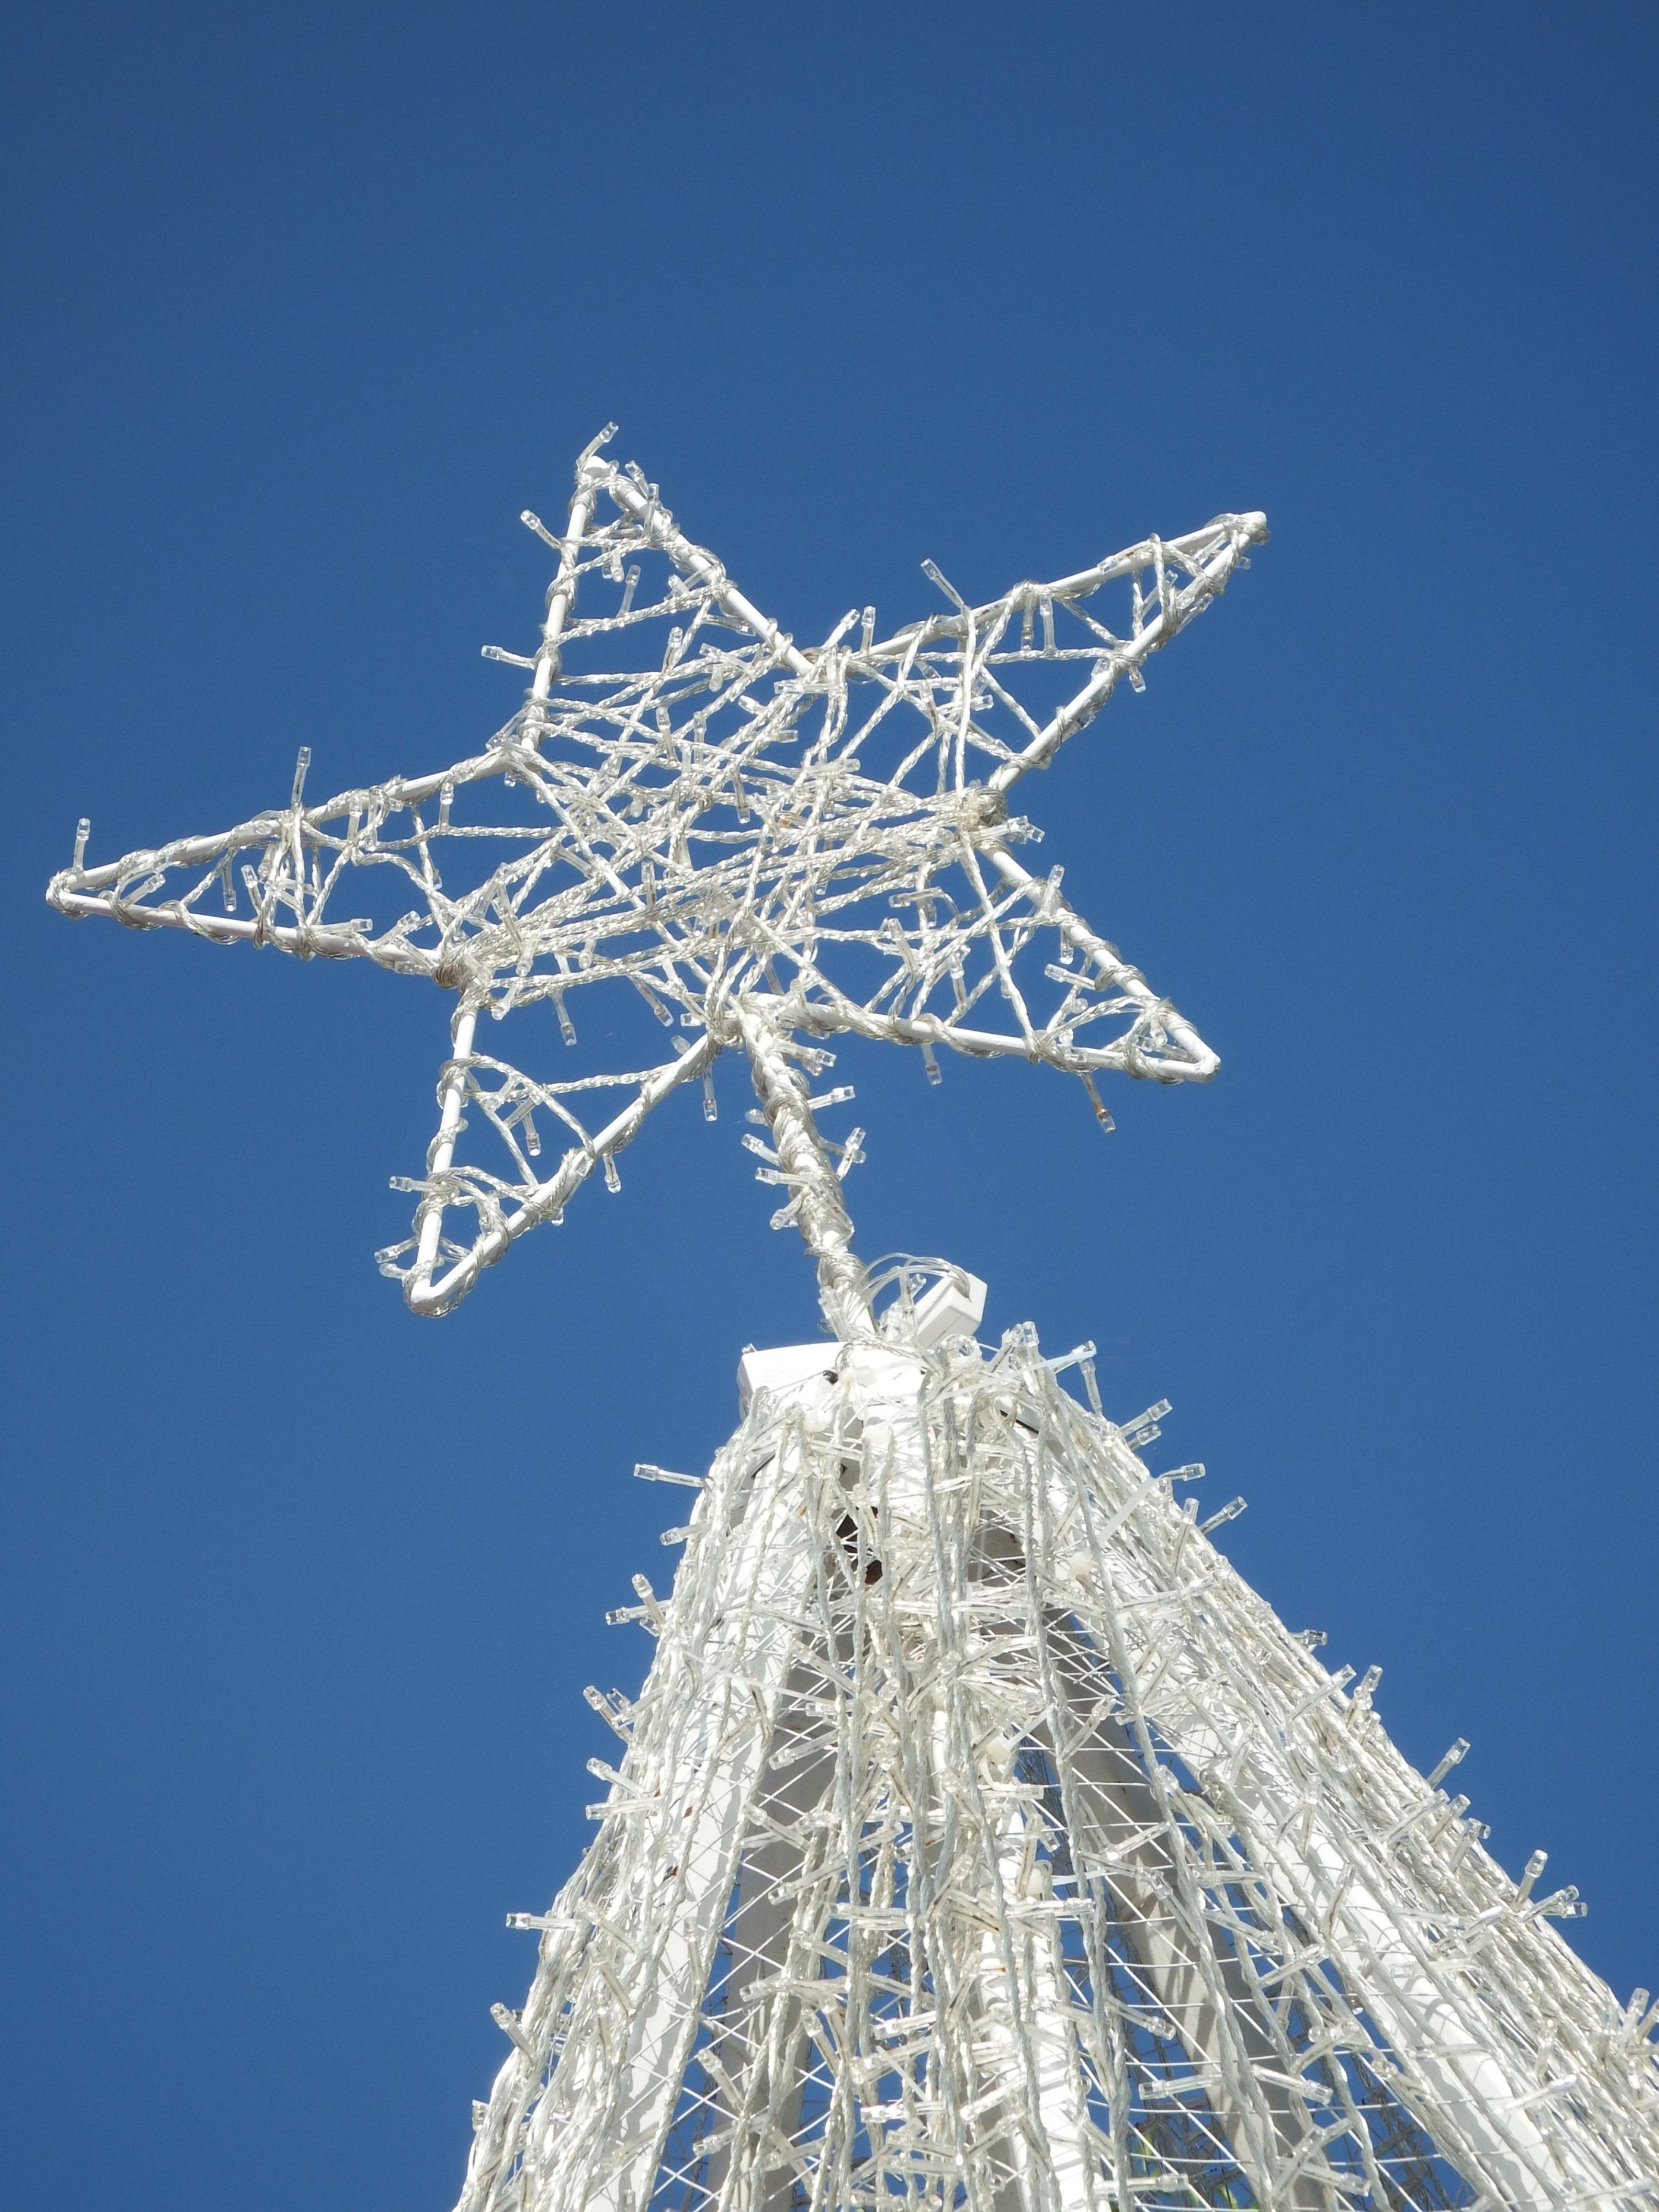 White Christmas Tree Star, Blue, Christmas, Decoration, Festive, HQ Photo